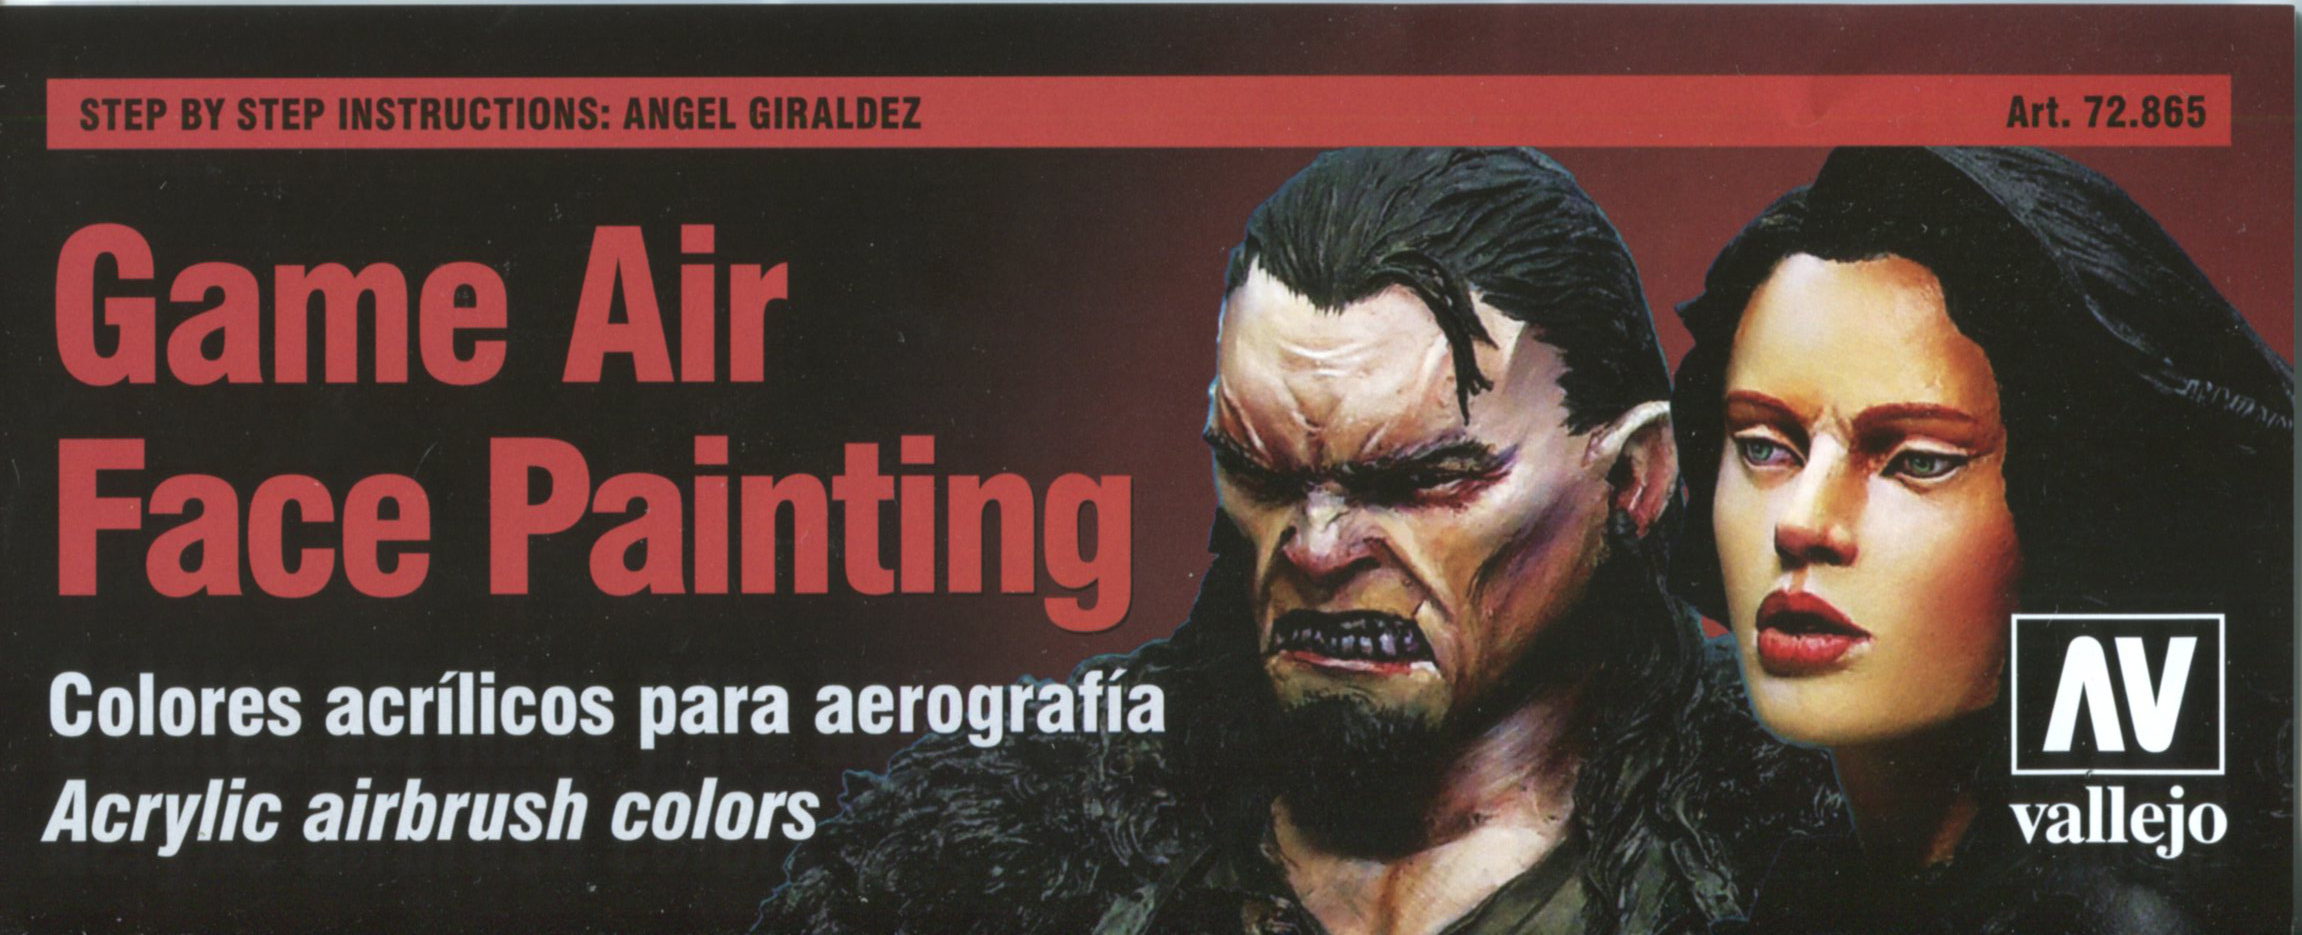 Face Paint213.jpg